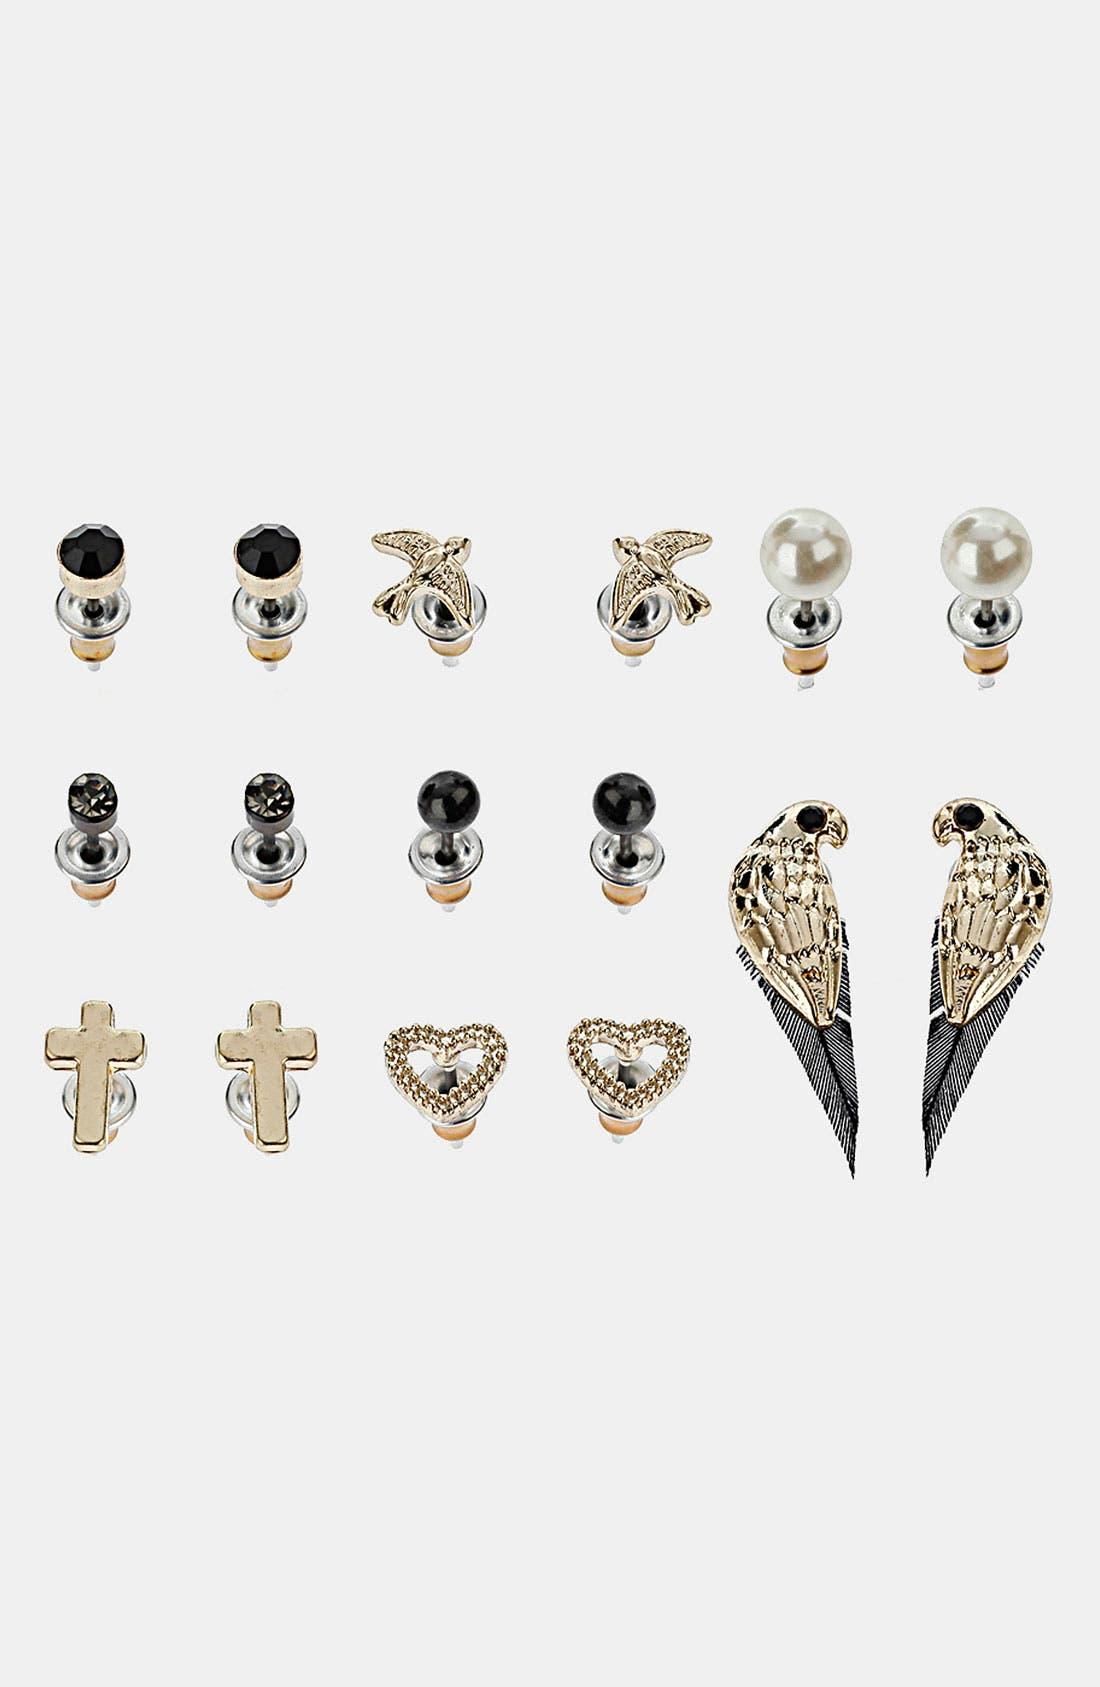 Main Image - Topshop 'Bird, Heart & Parrot' Stud Earrings (Set of 8)